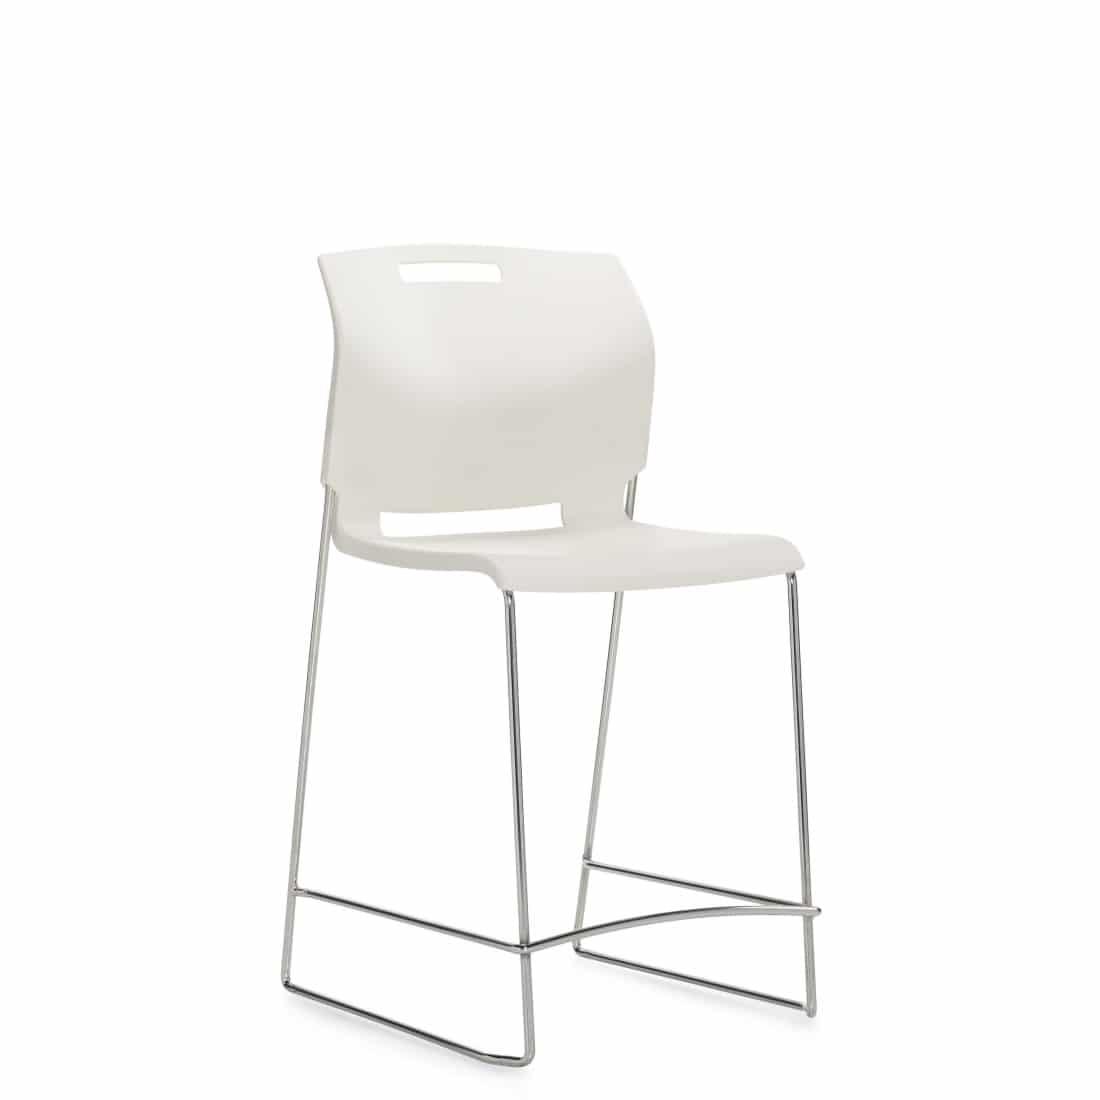 Armless Counter Stool, White Polypropylene Seat & Back With Chrome Frame (6711CS)